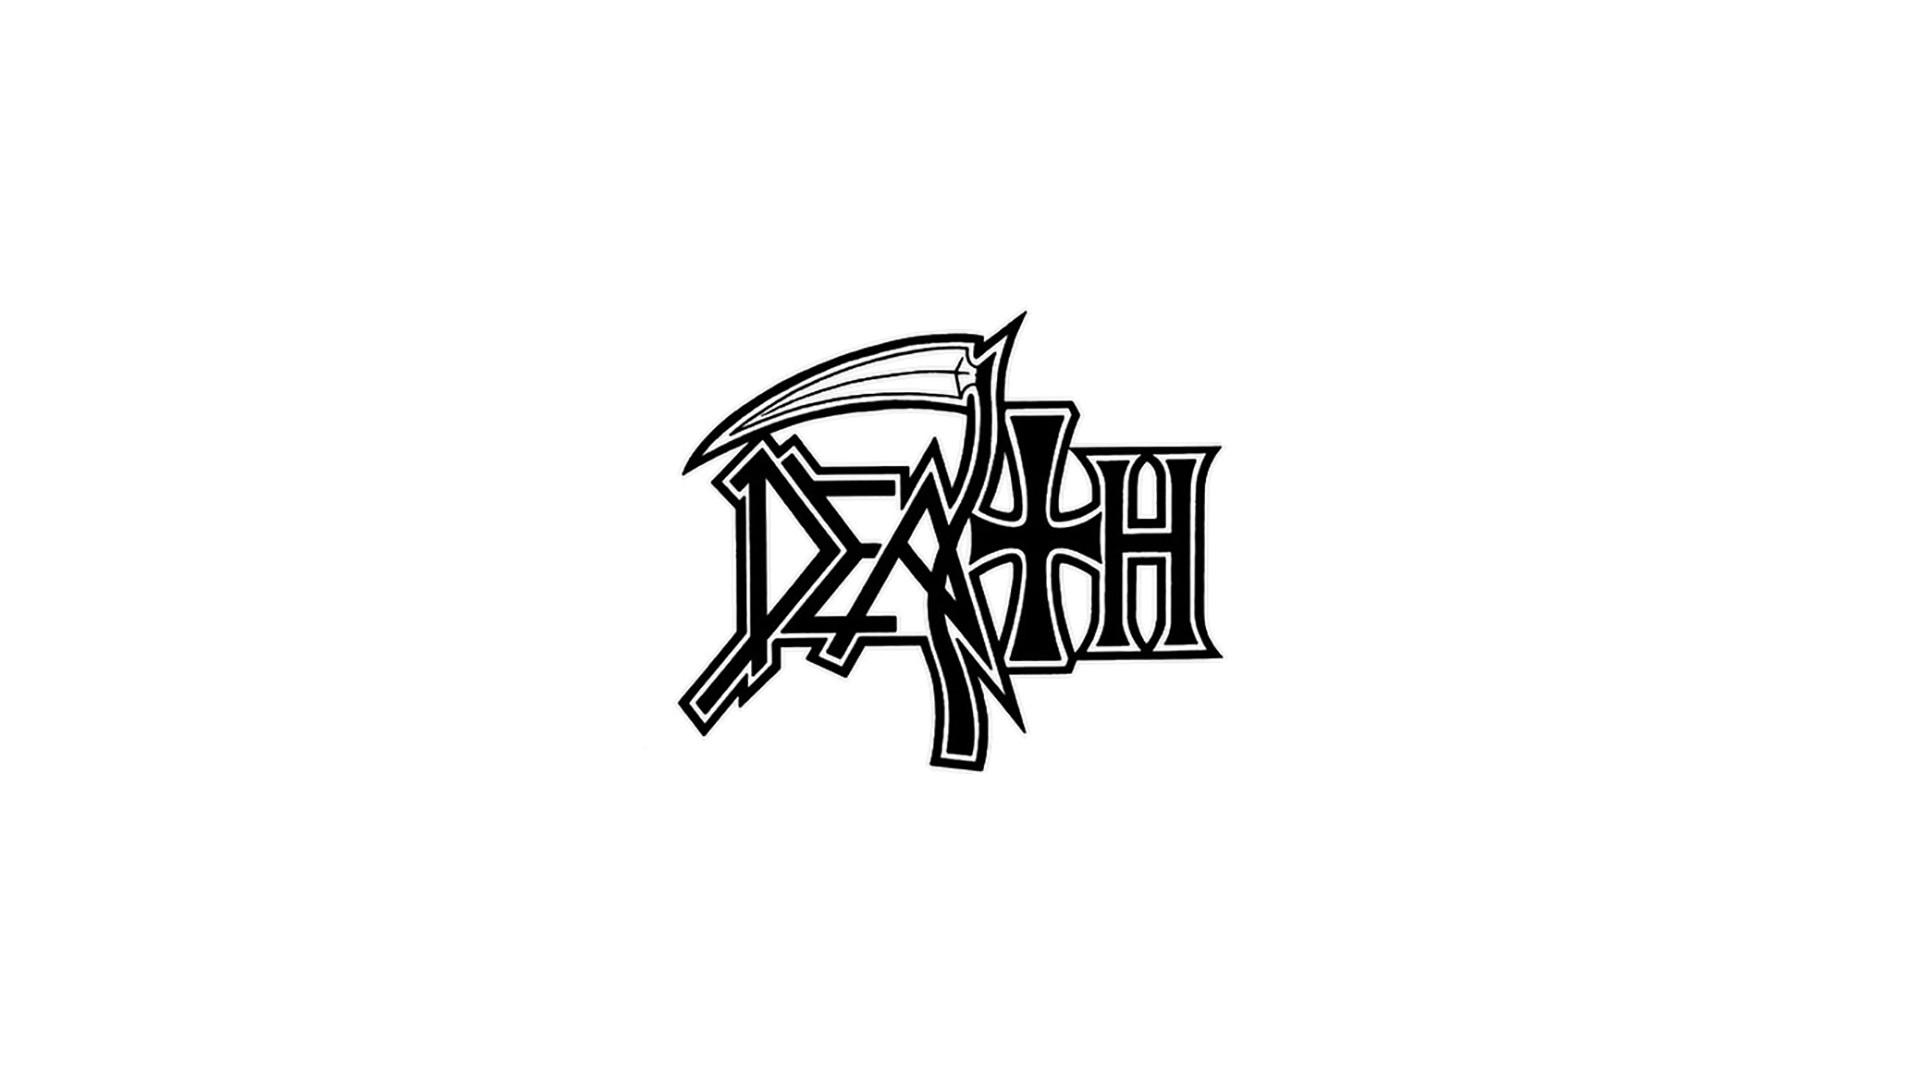 General 1920x1080 band death metal minimalism